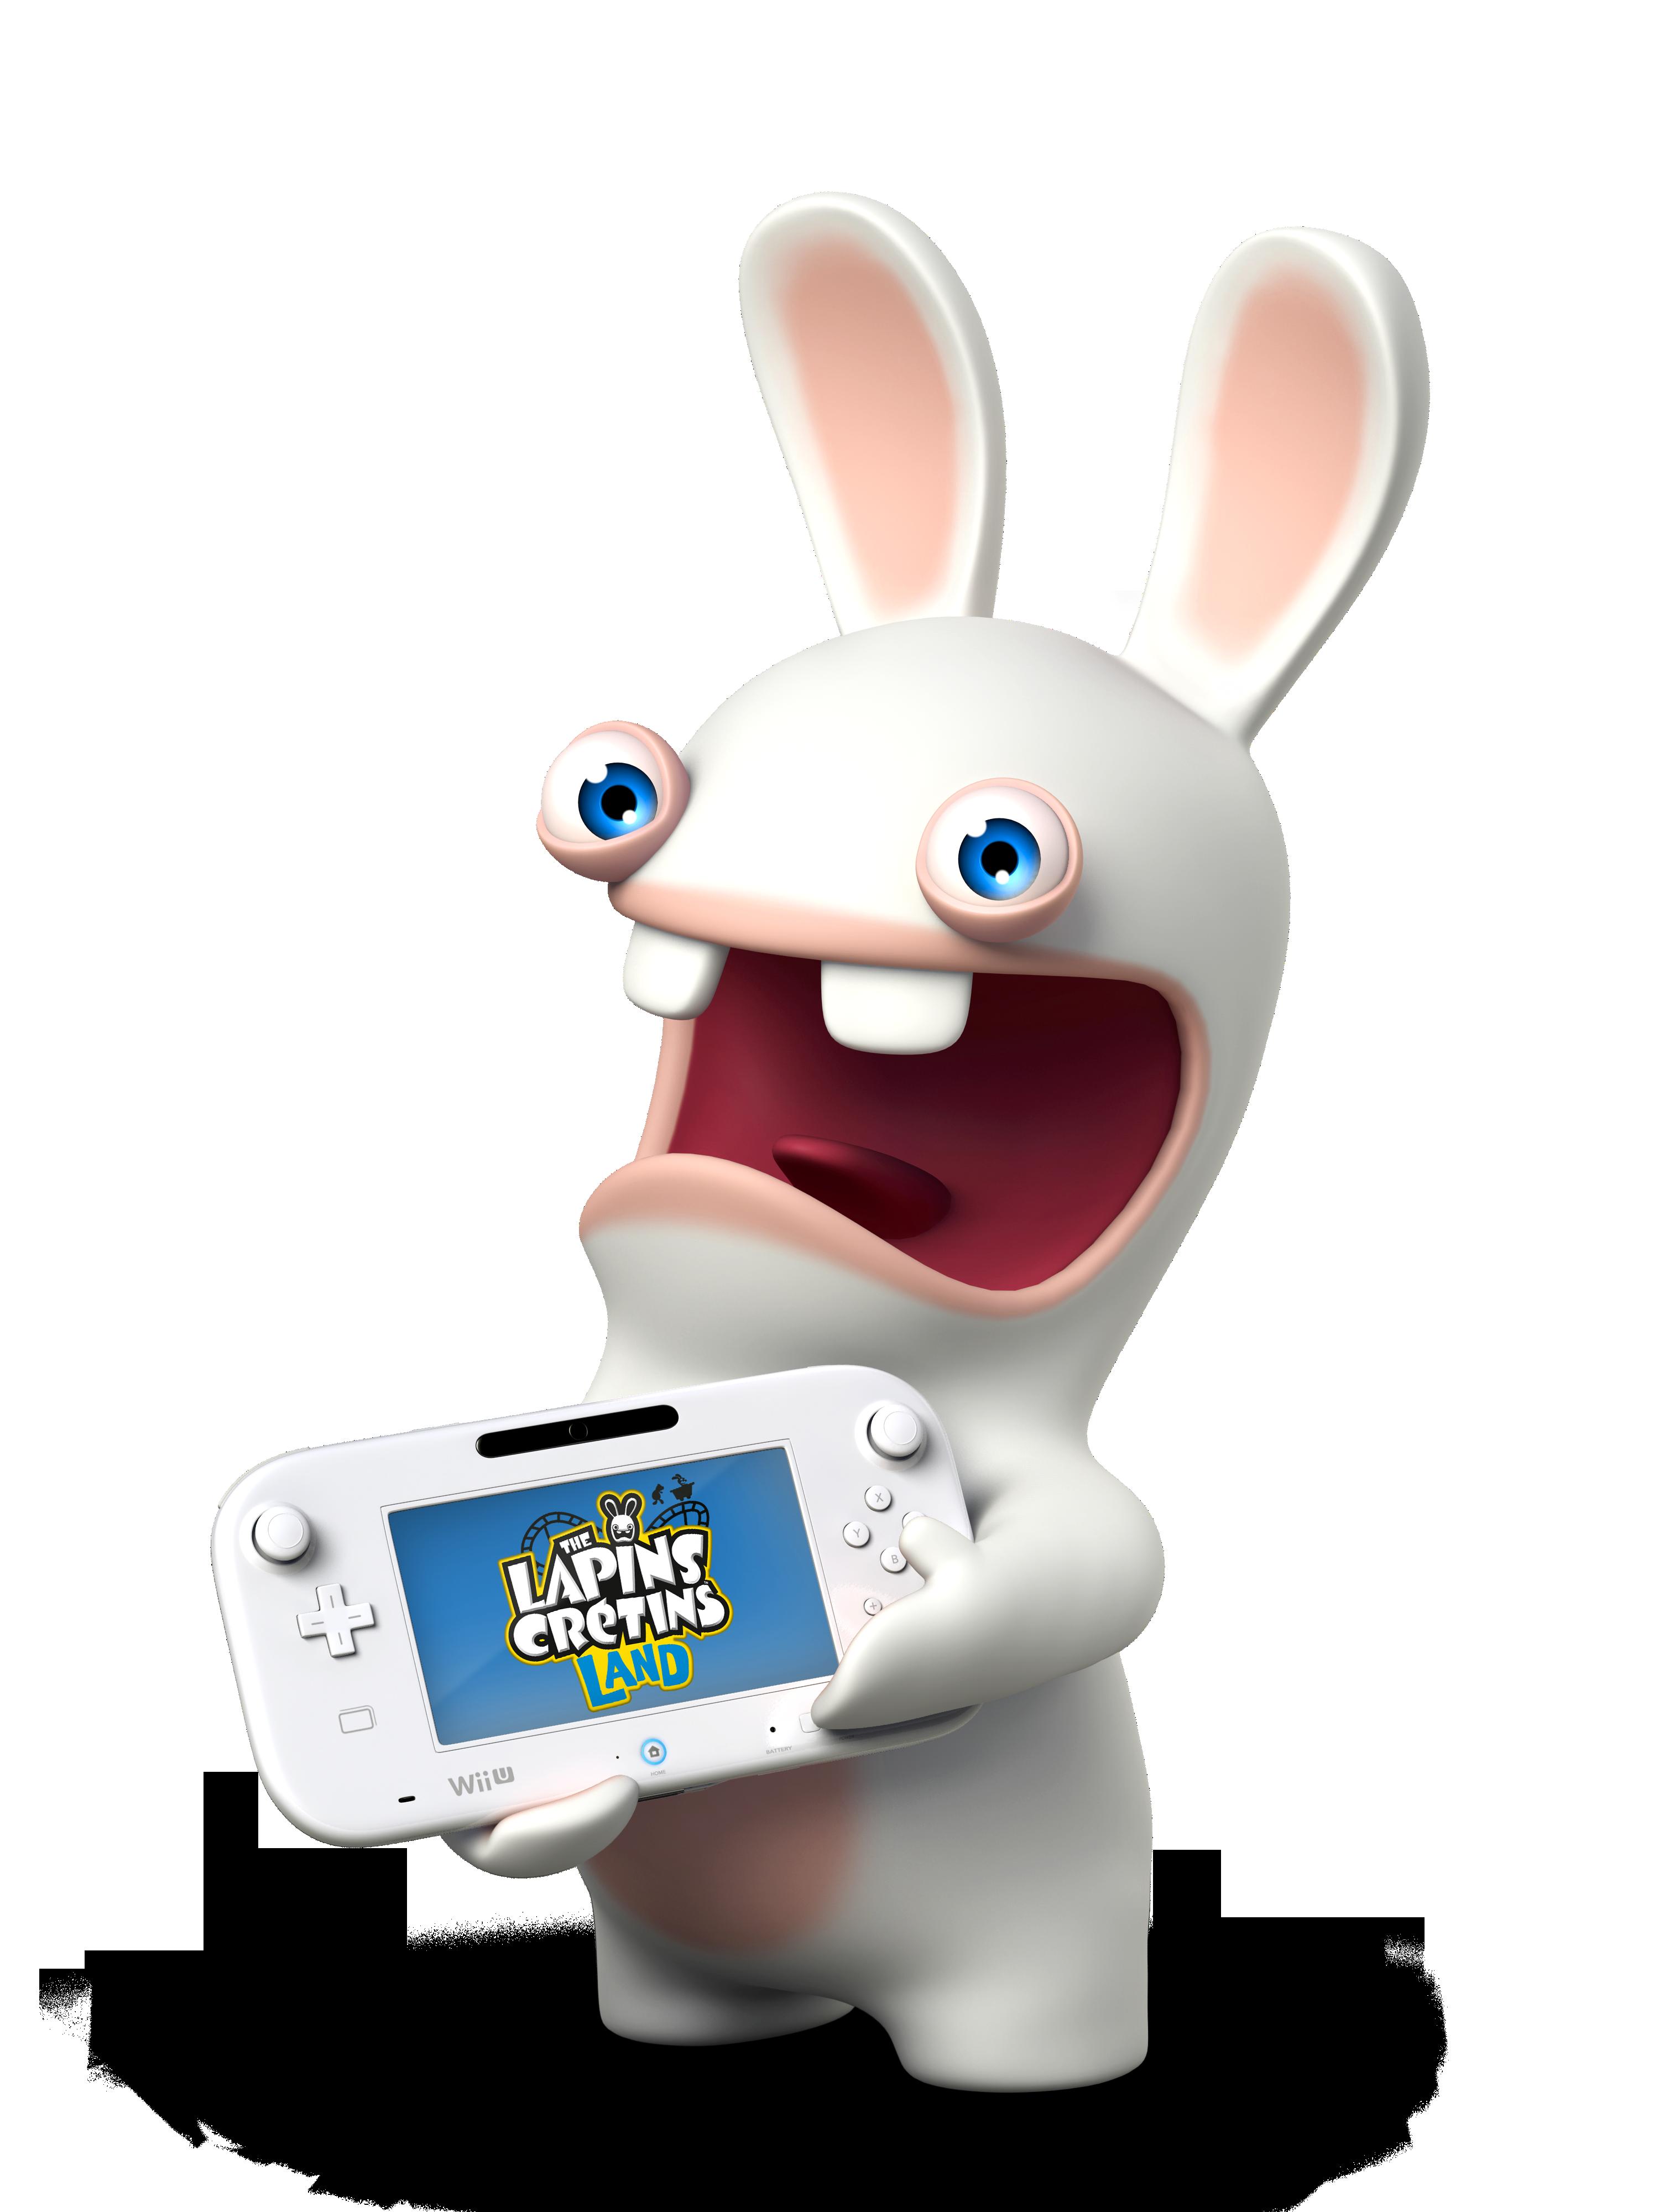 TheLapinsCretinsLand Wii U Visuel 002